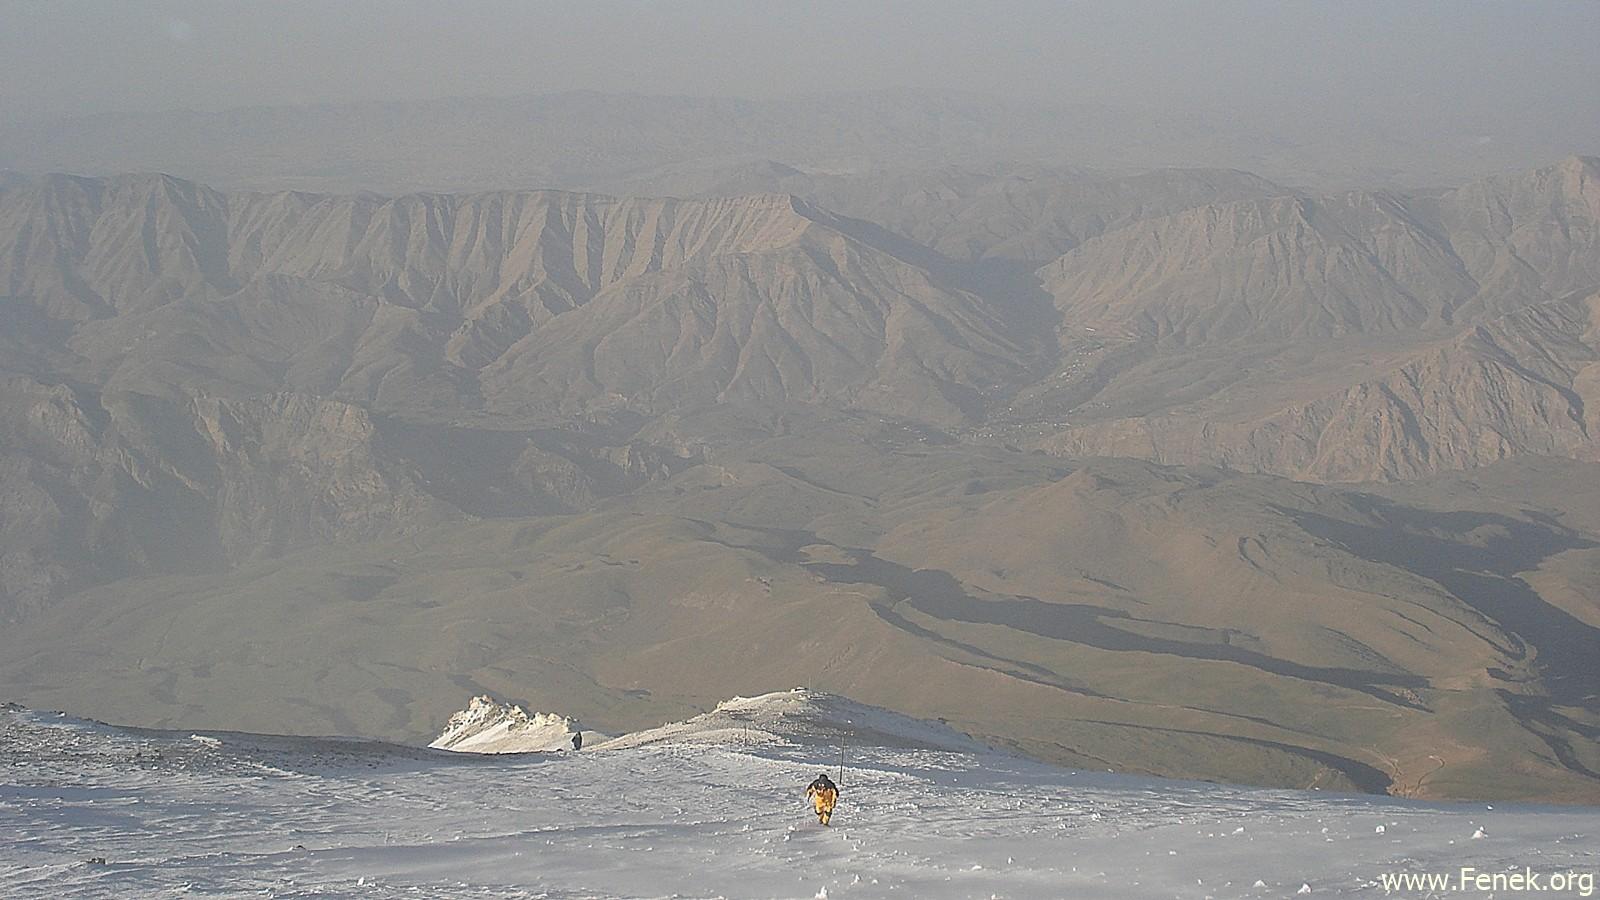 Tiefblick kurz unter dem Gipfel